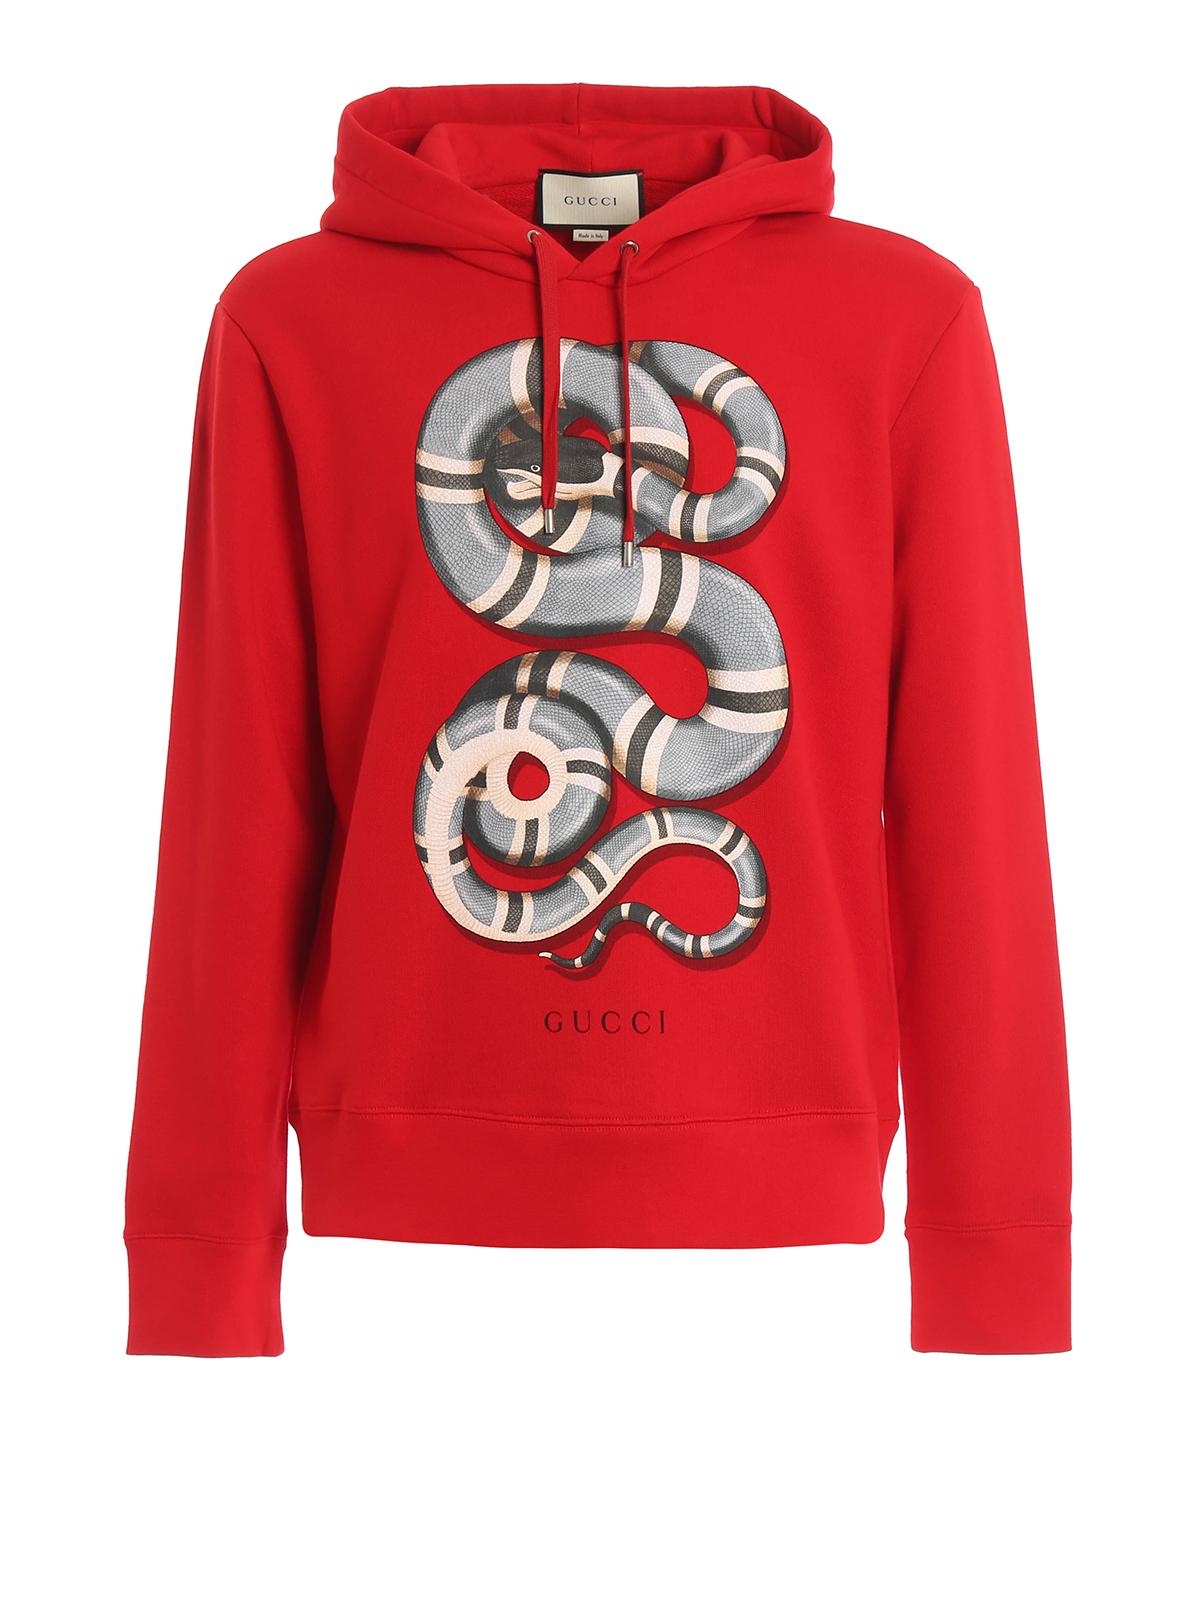 Snake print hoodie by Gucci - Sweatshirts & Sweaters | iKRIX